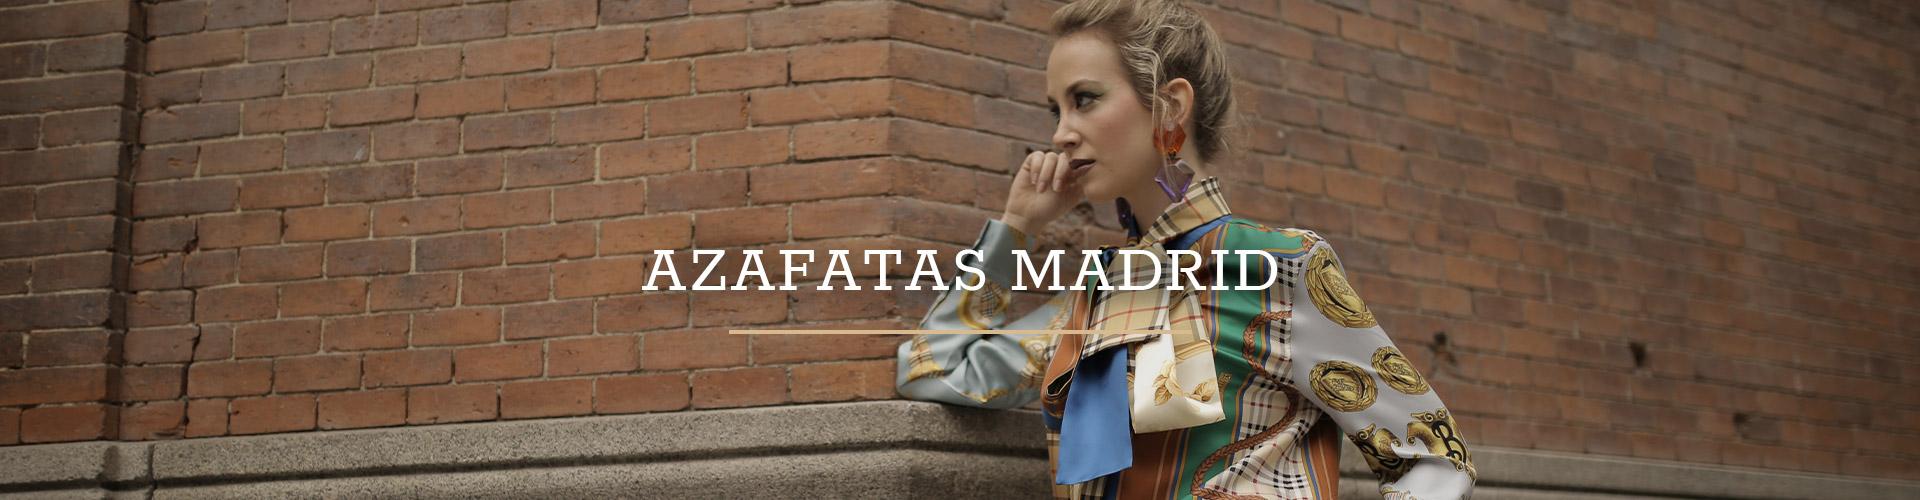 Azafatas Madrid